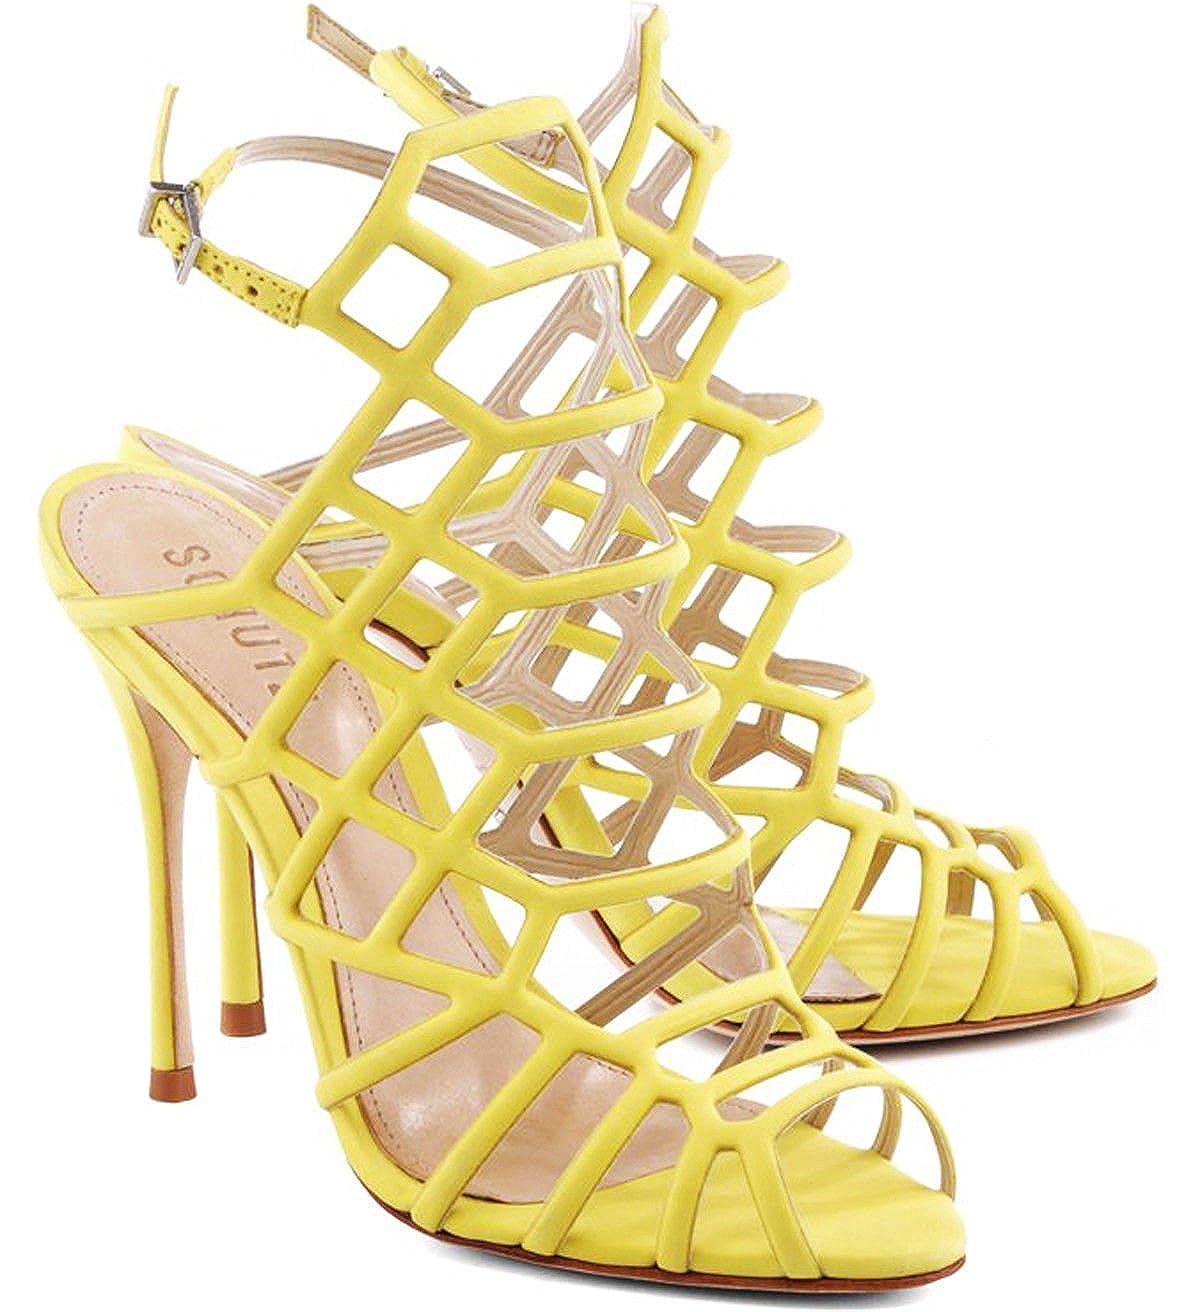 d336f897077 Amazon.com  SCHUTZ Juliana Mellon Bright Yellow Stiletto High Heel Caged  Dress Pump Sandals  Shoes